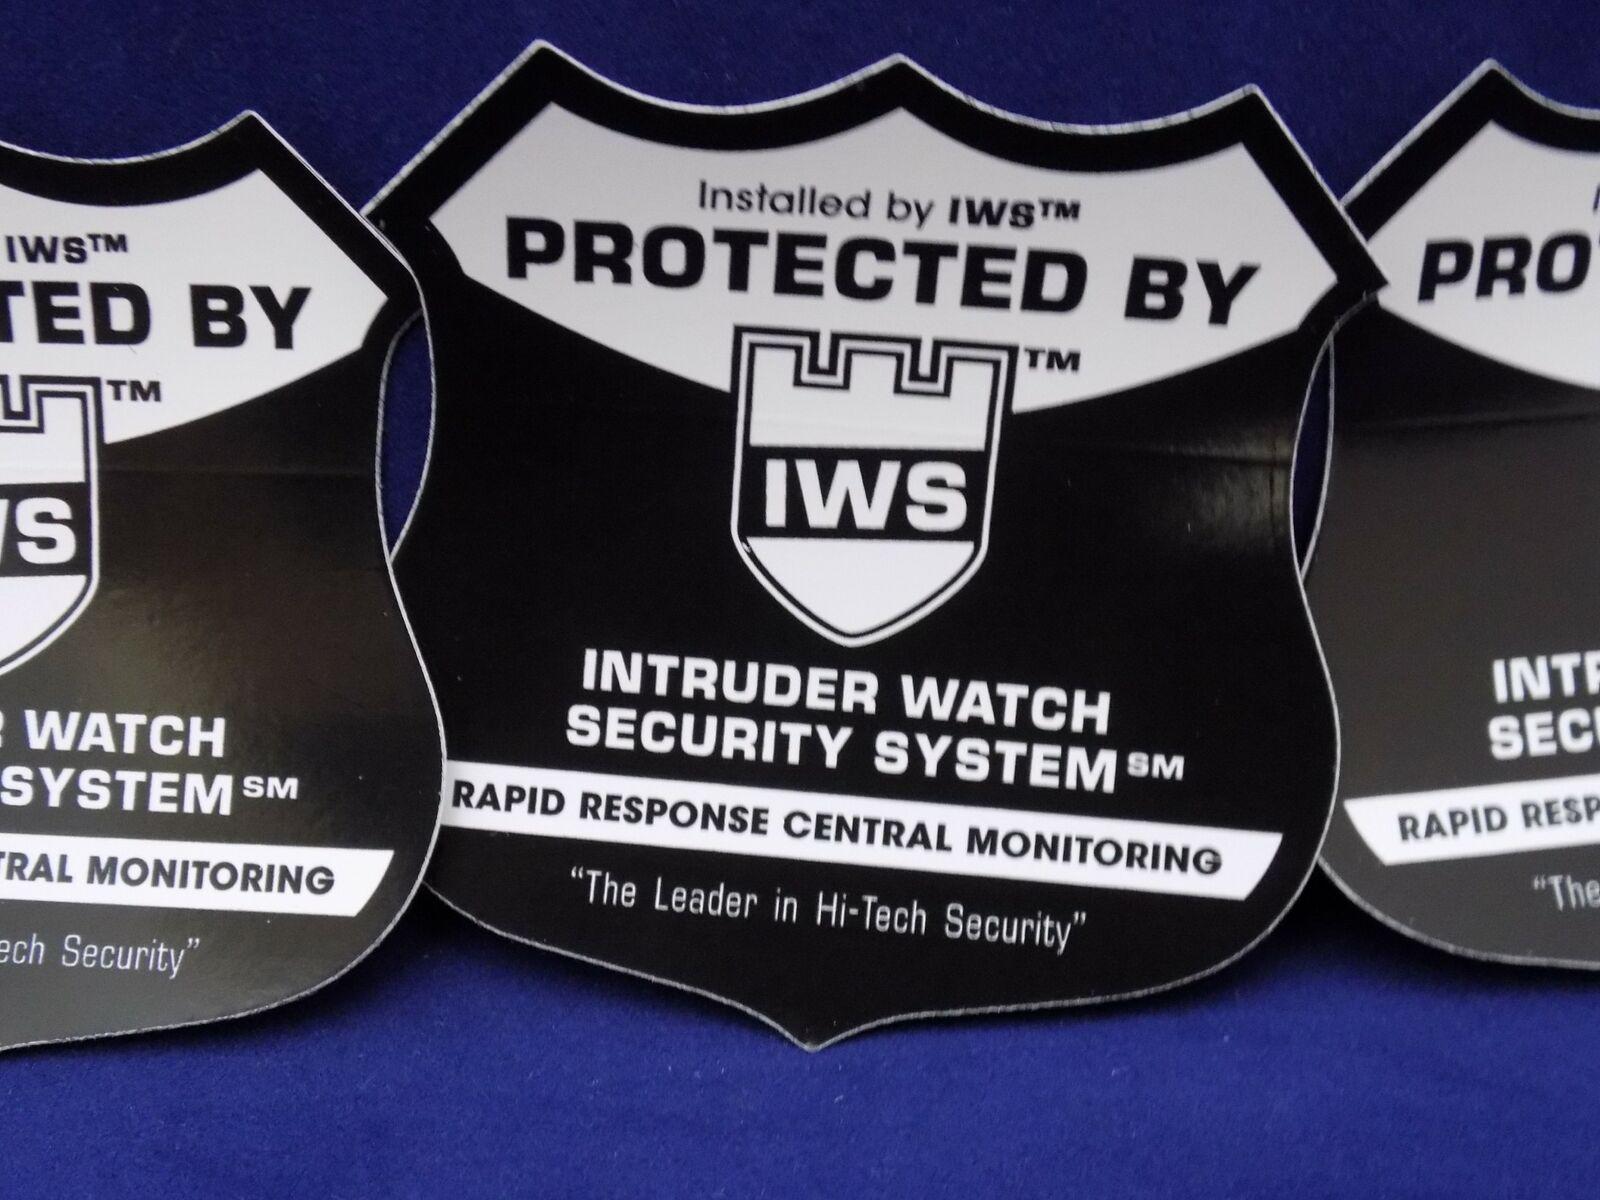 14 IWS Home Security Alarm Stickers UV Alarm Stickers Windows & Door Placement